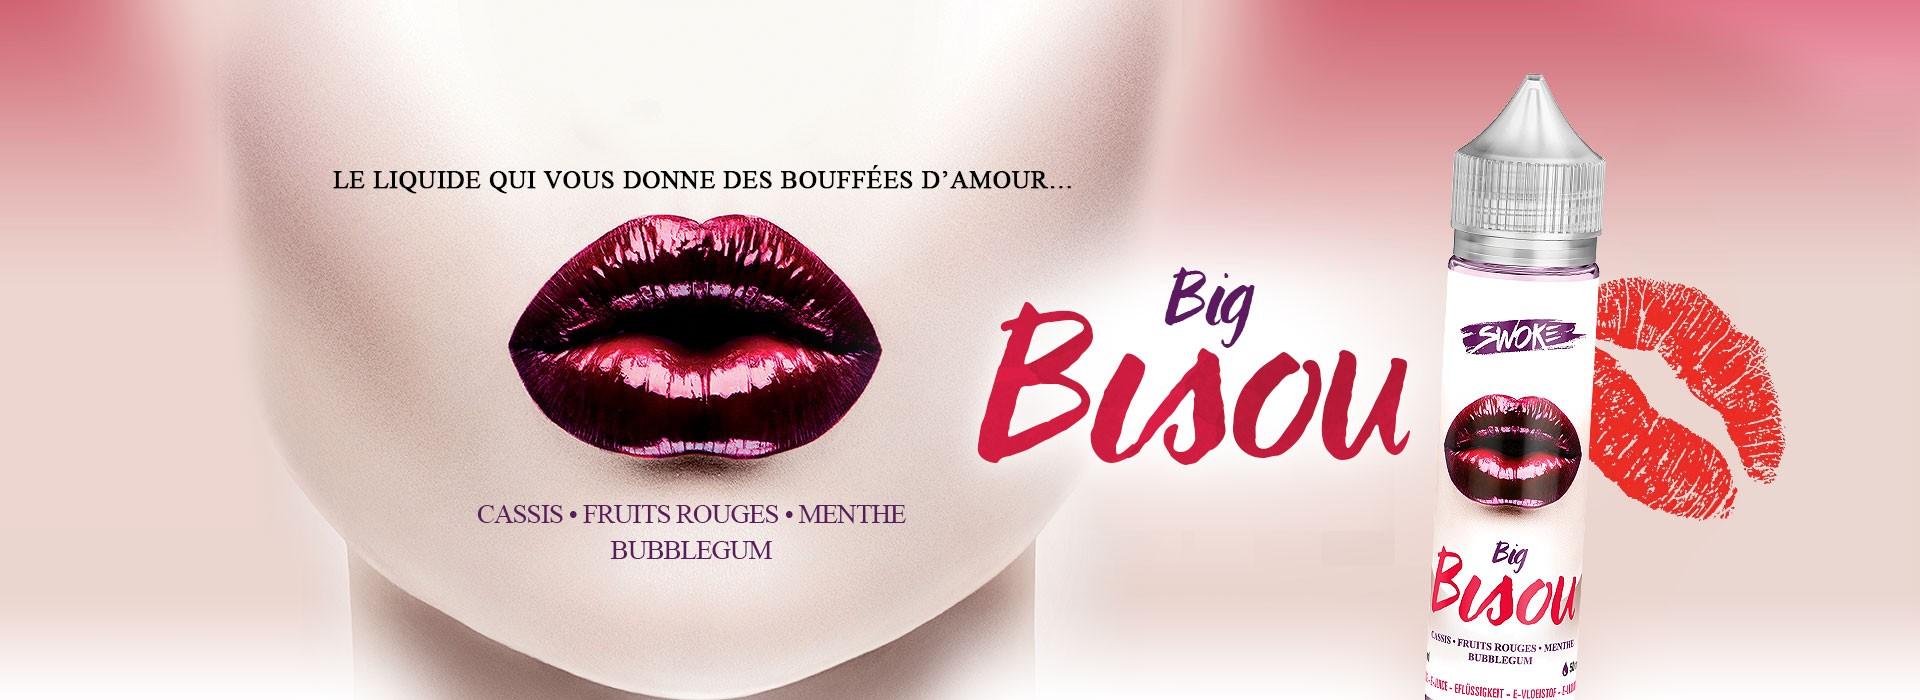 Qui veut un gros baiser ?